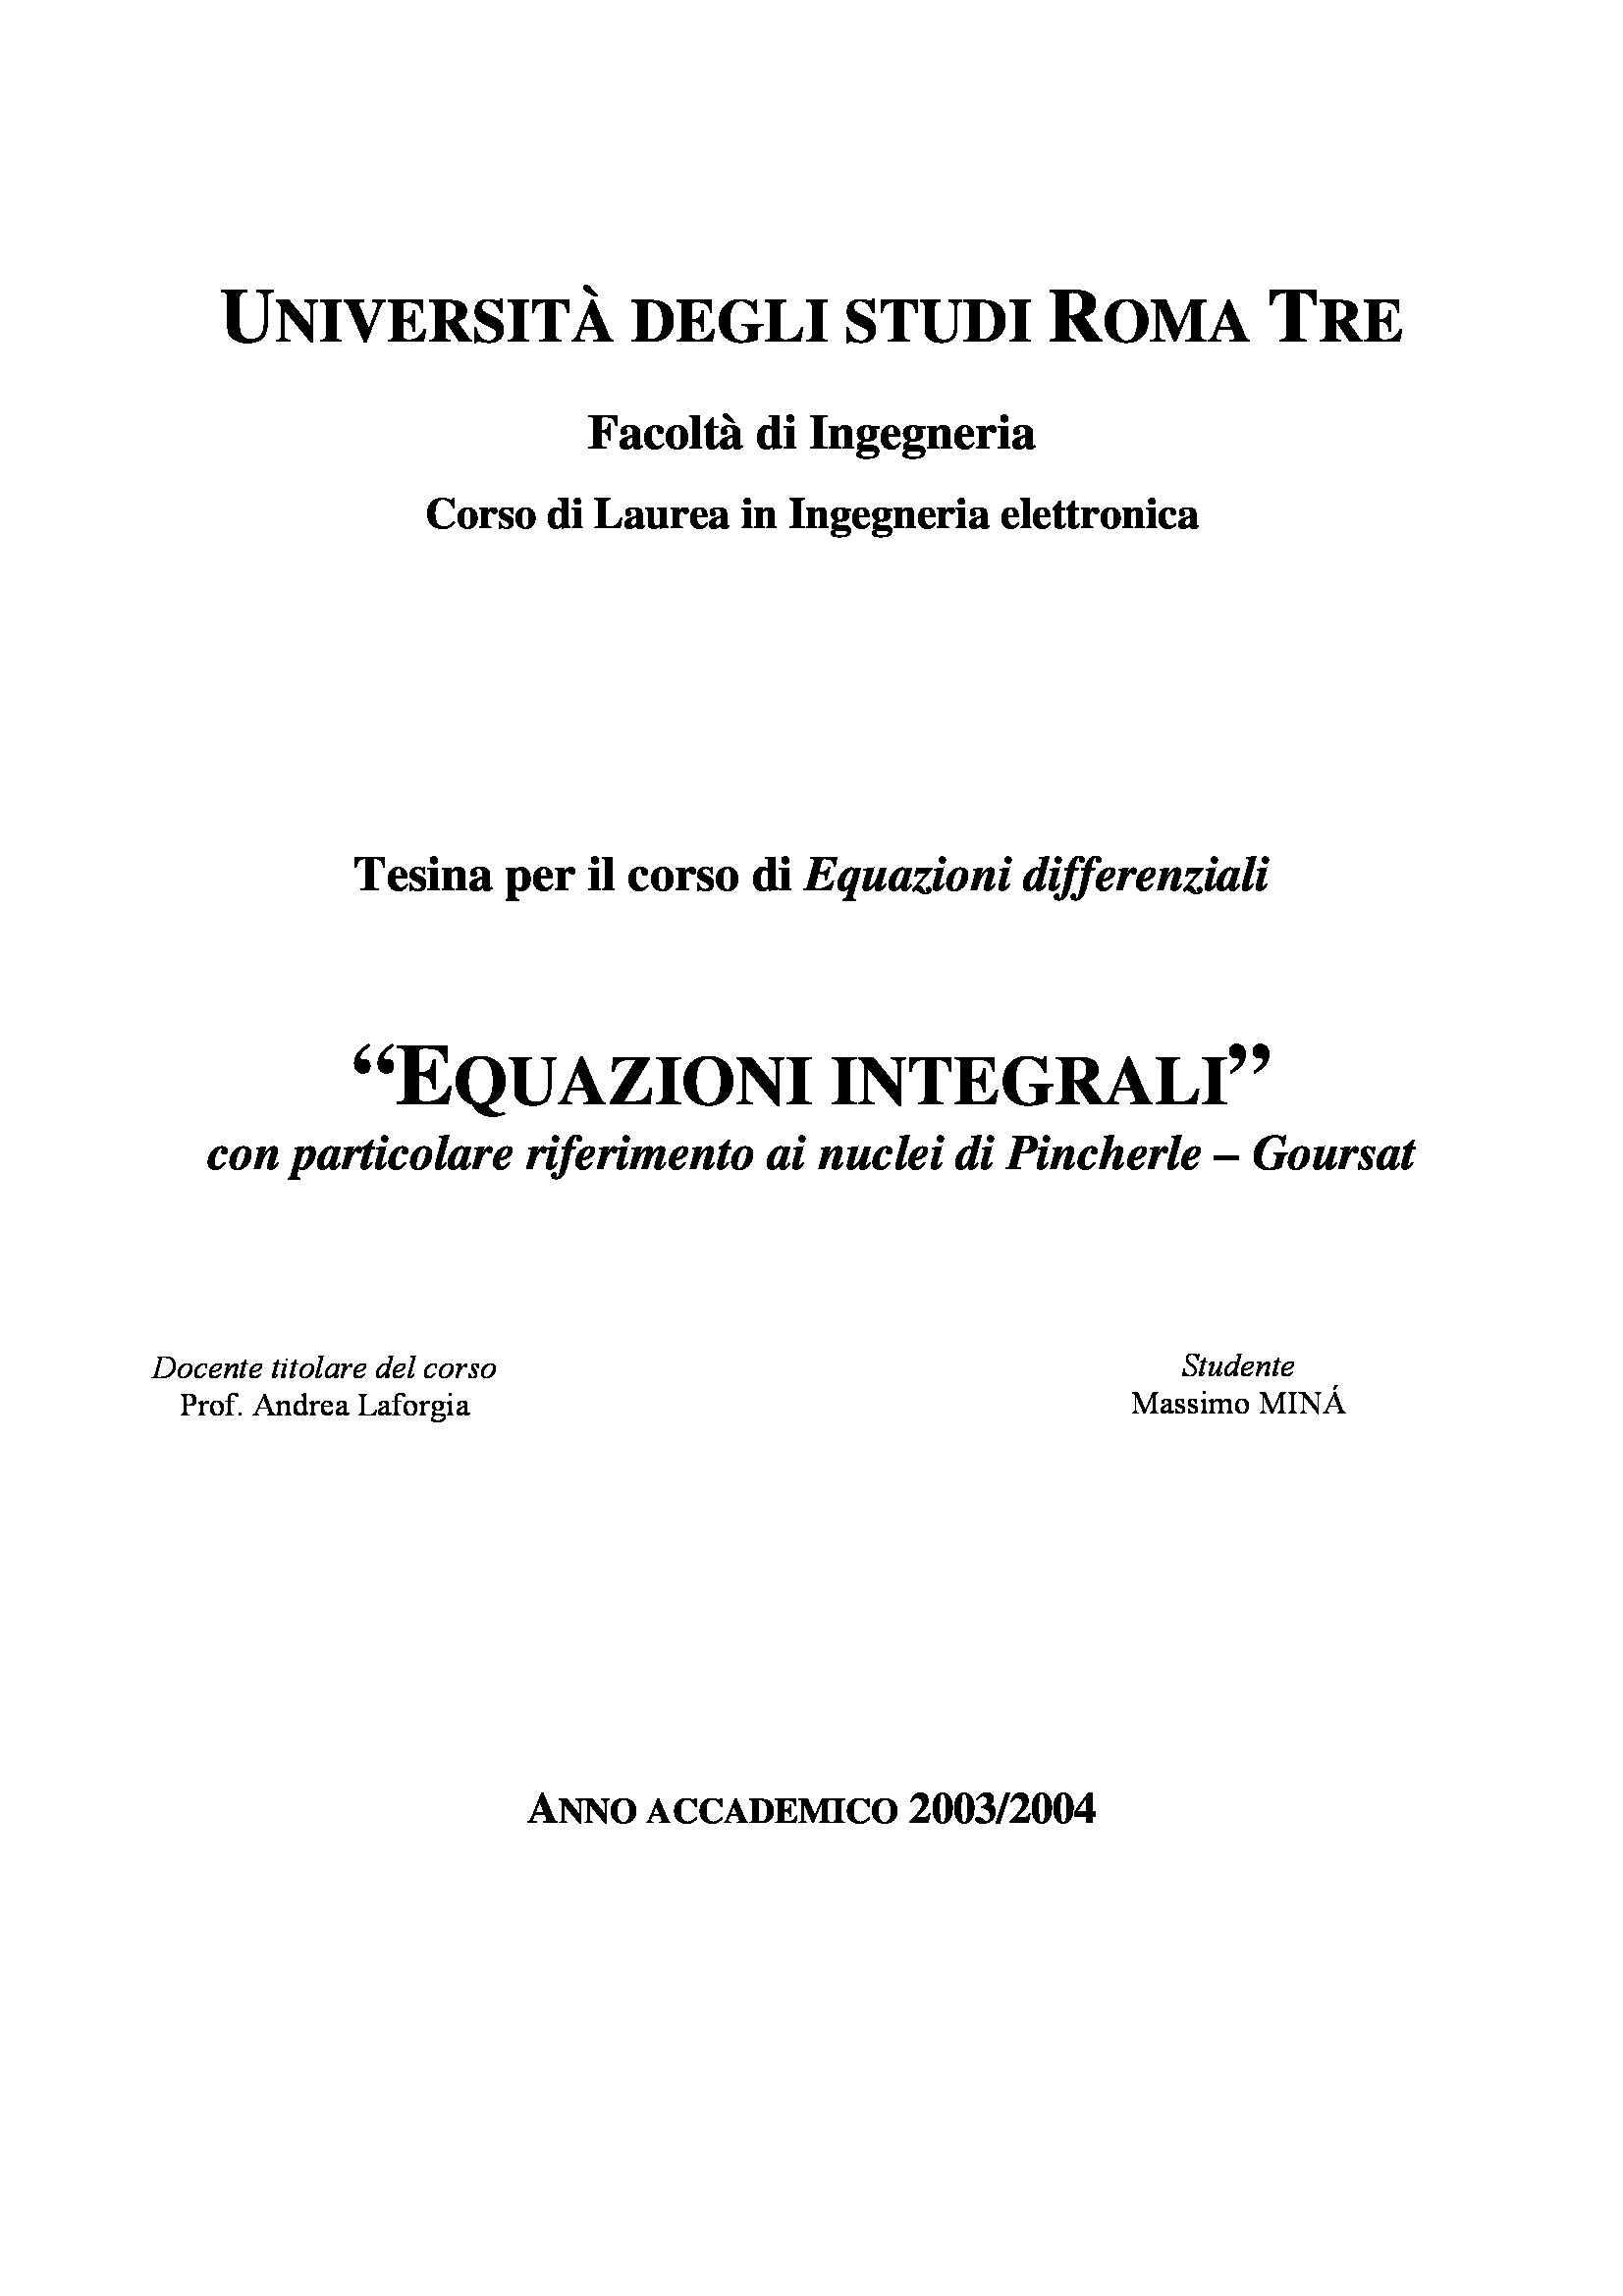 appunto A. Laforgia Metodi matematici per l'ingegneria